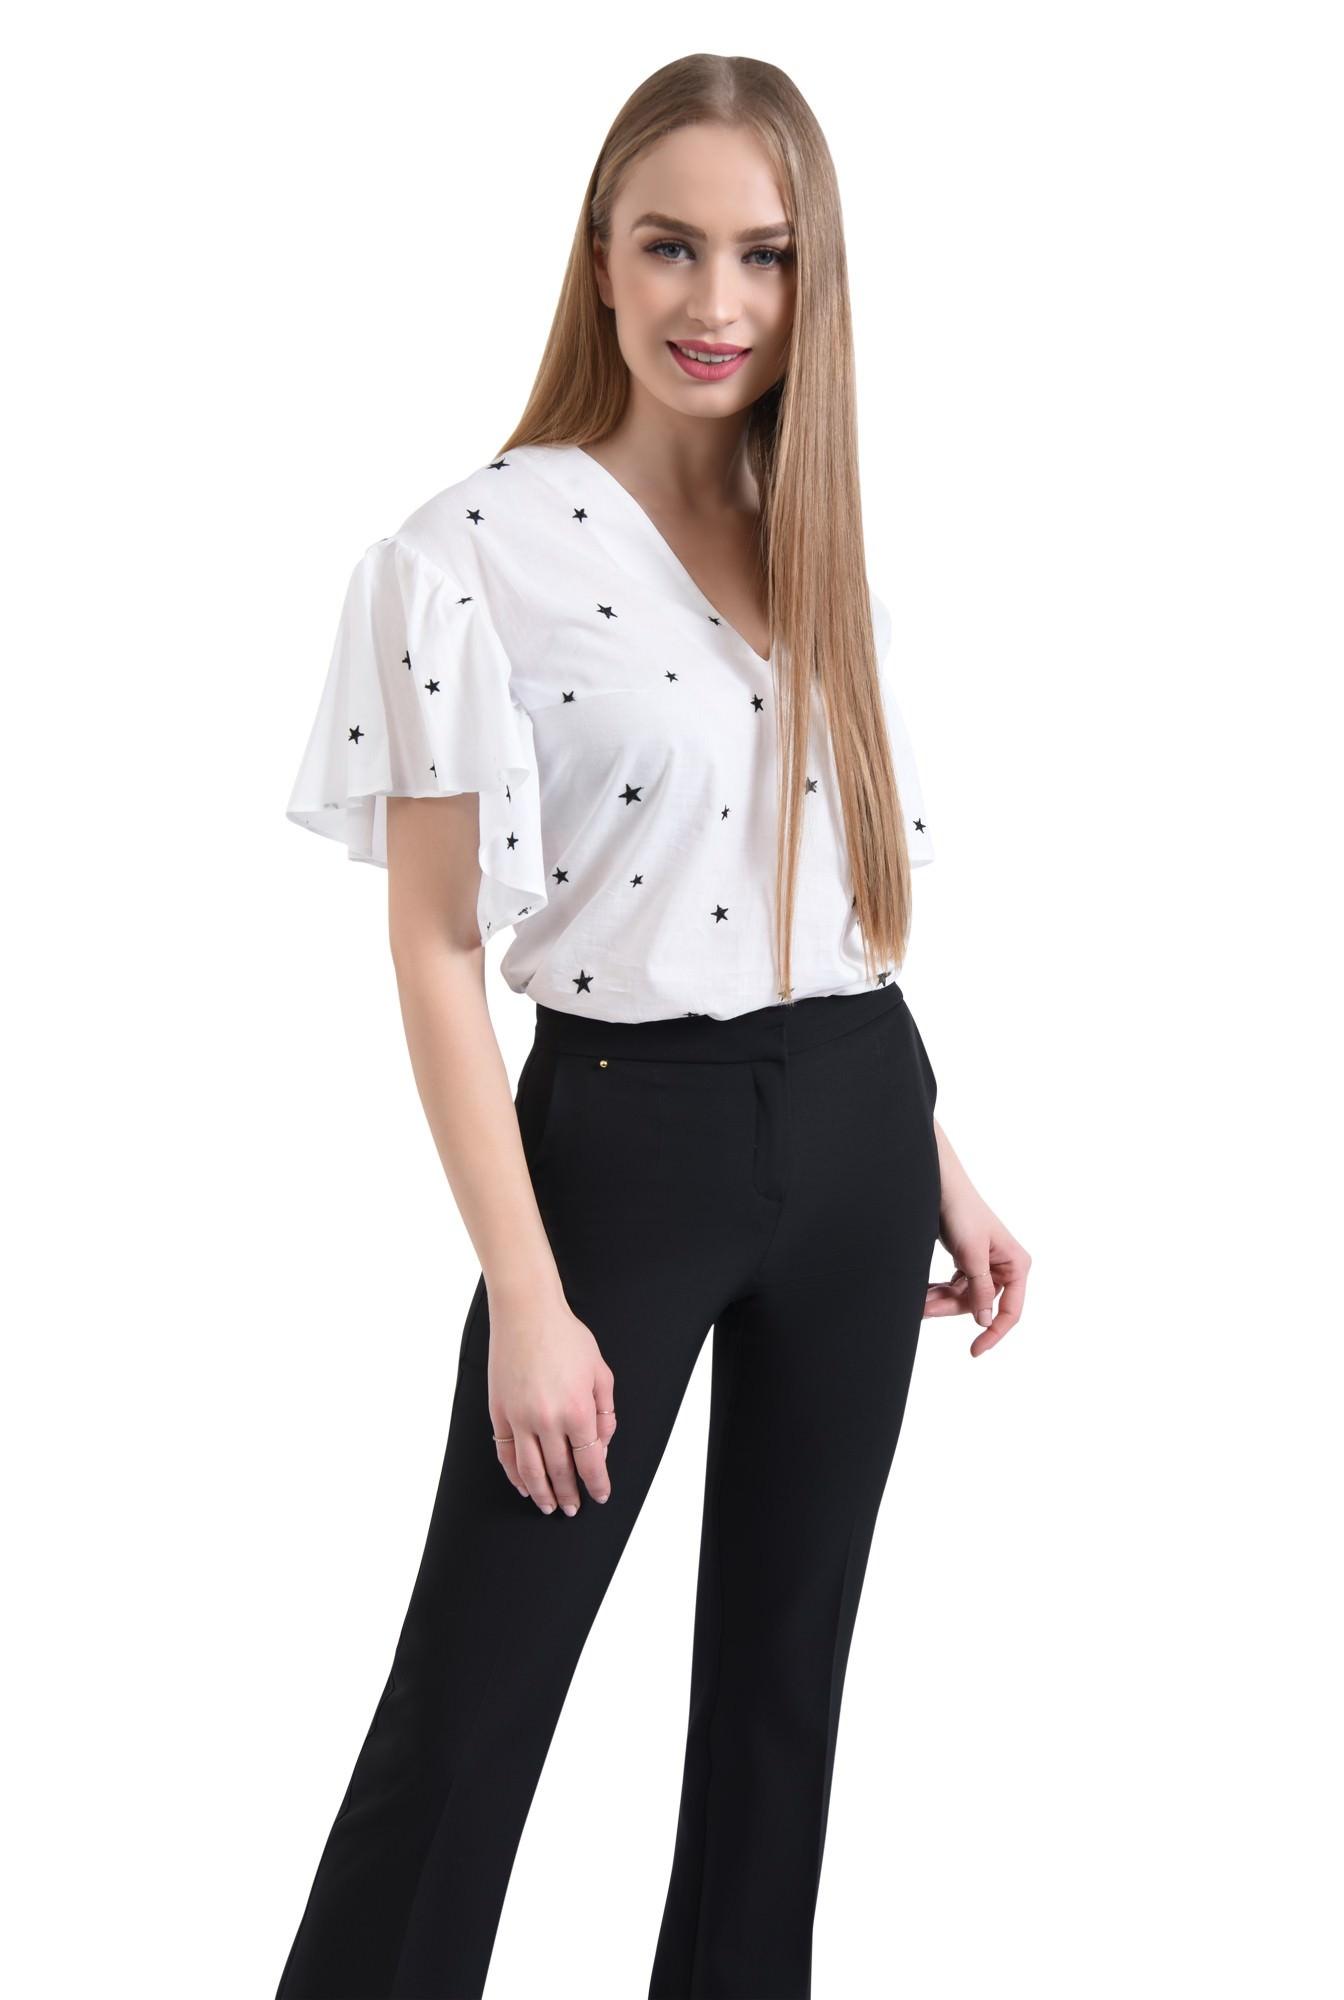 Bluza casual, alb, anchior